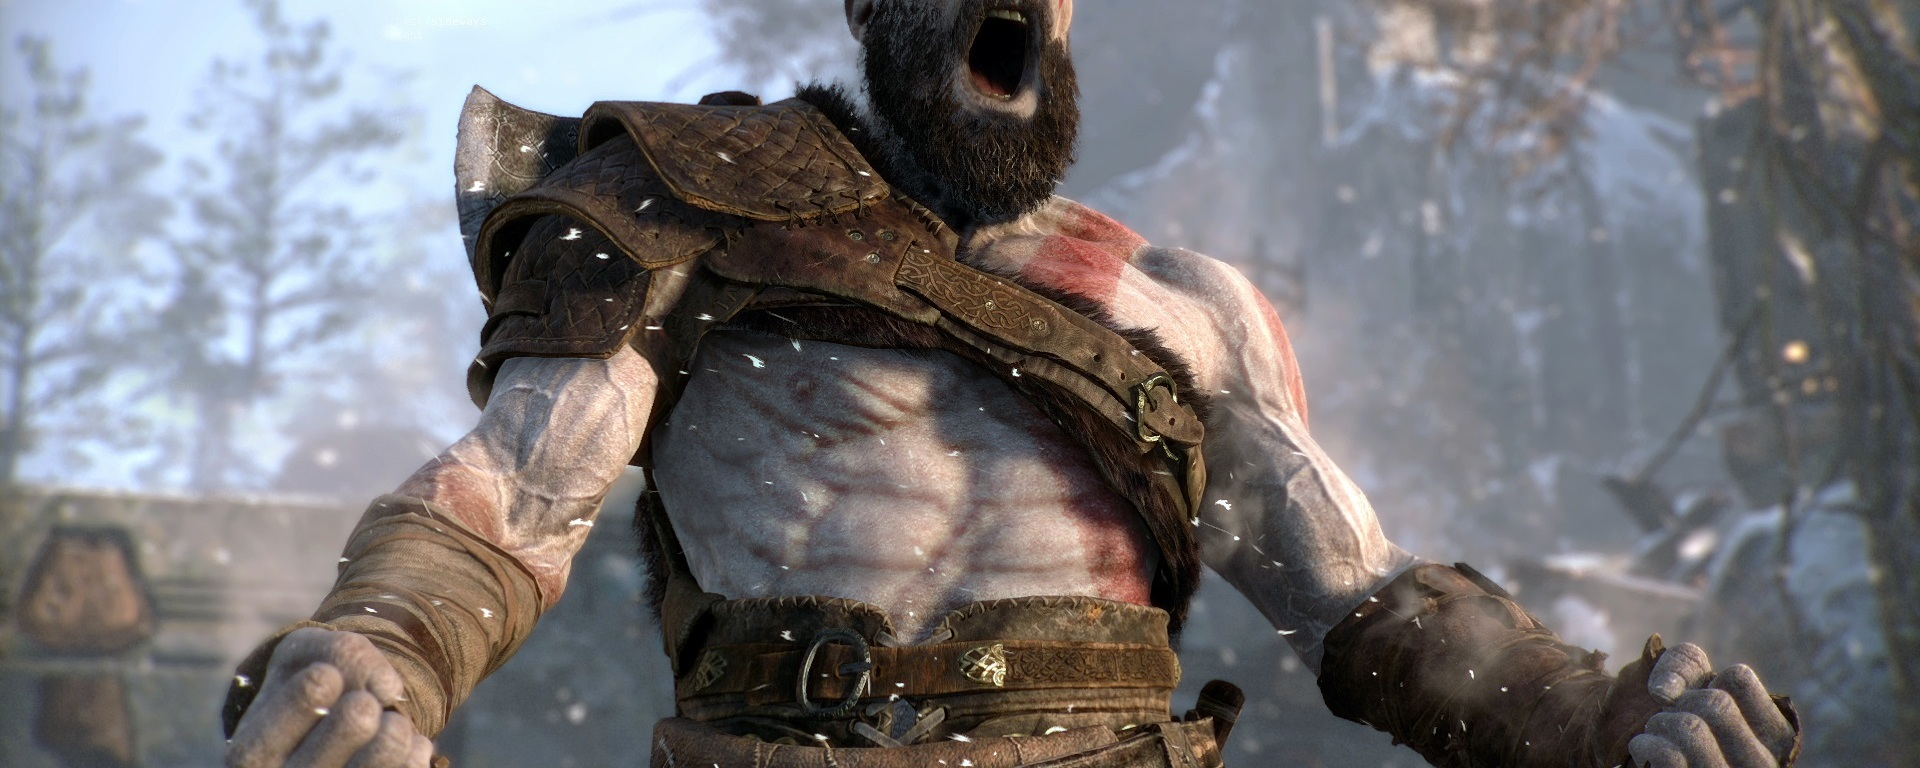 Kratos-Cinema-Gizmo